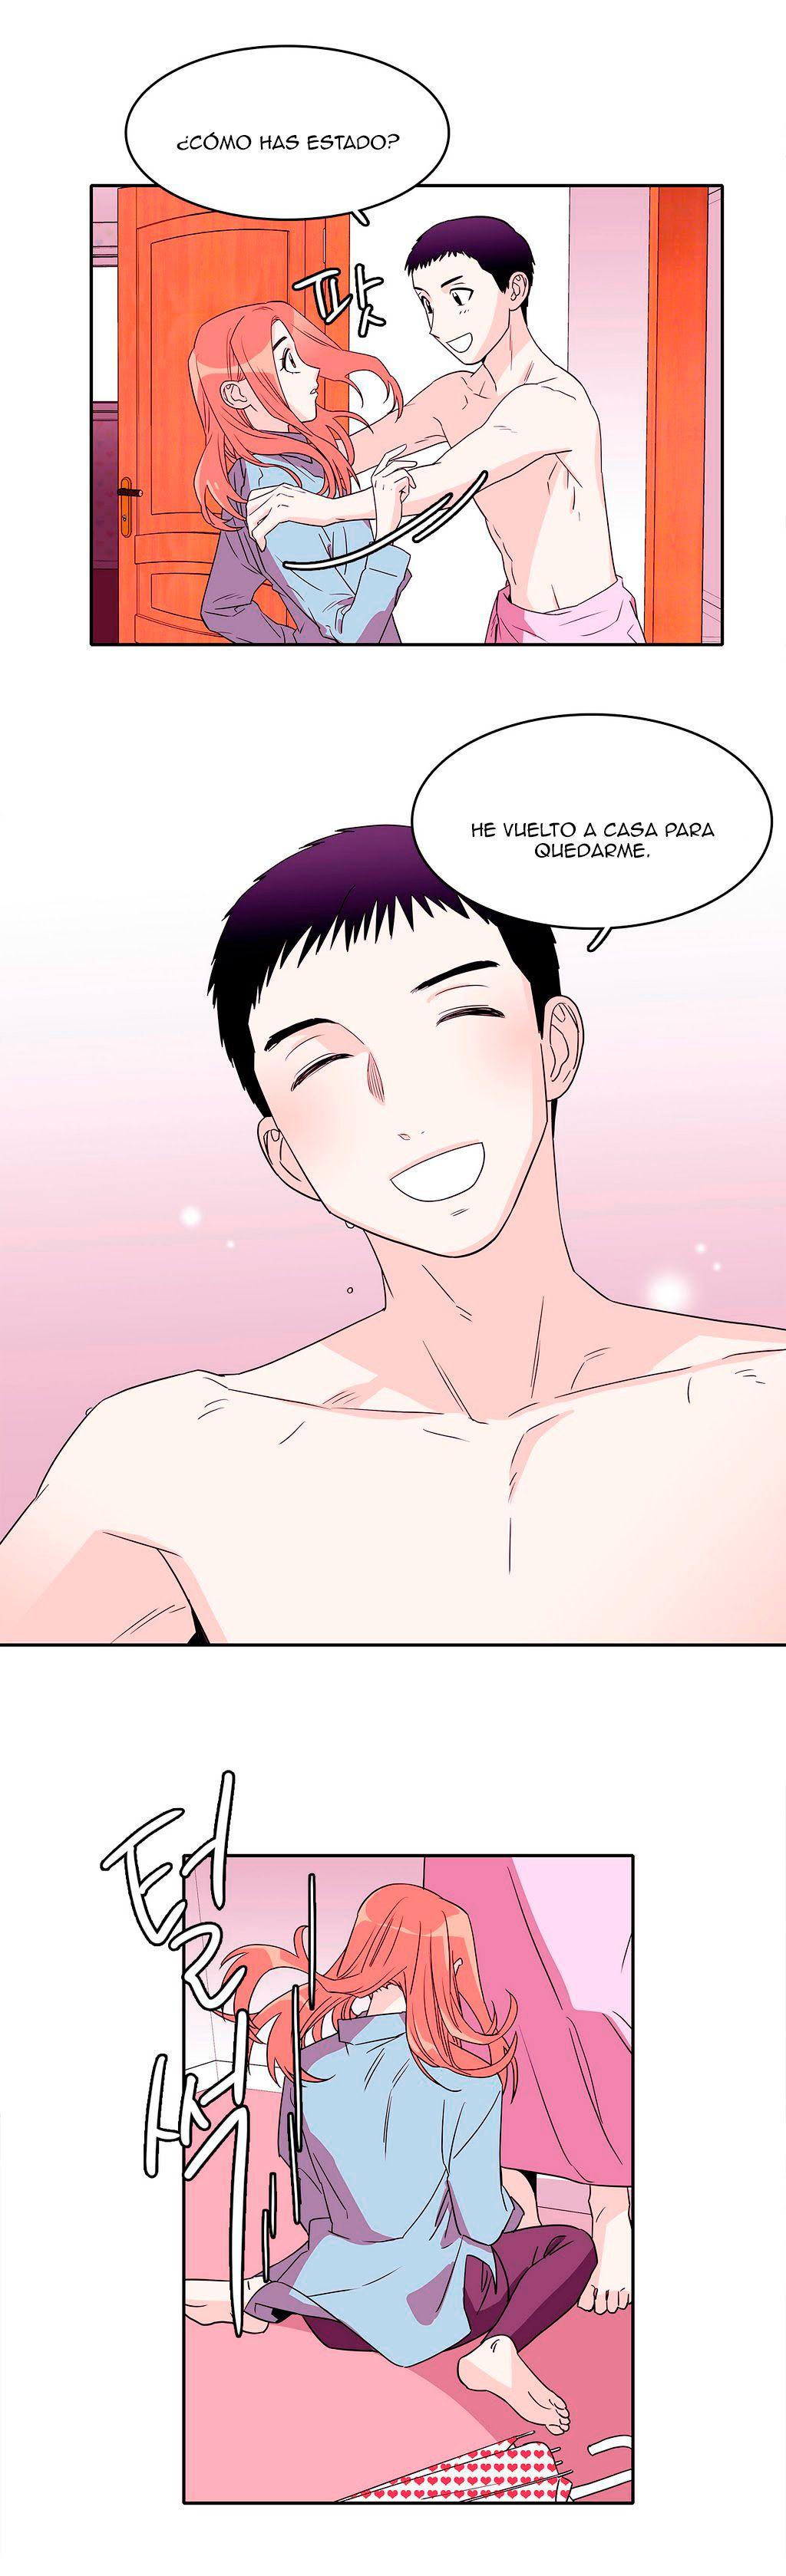 http://c5.ninemanga.com/es_manga/51/19443/466082/9c415bdd4dd66723ef7b38853ef35ddb.jpg Page 4